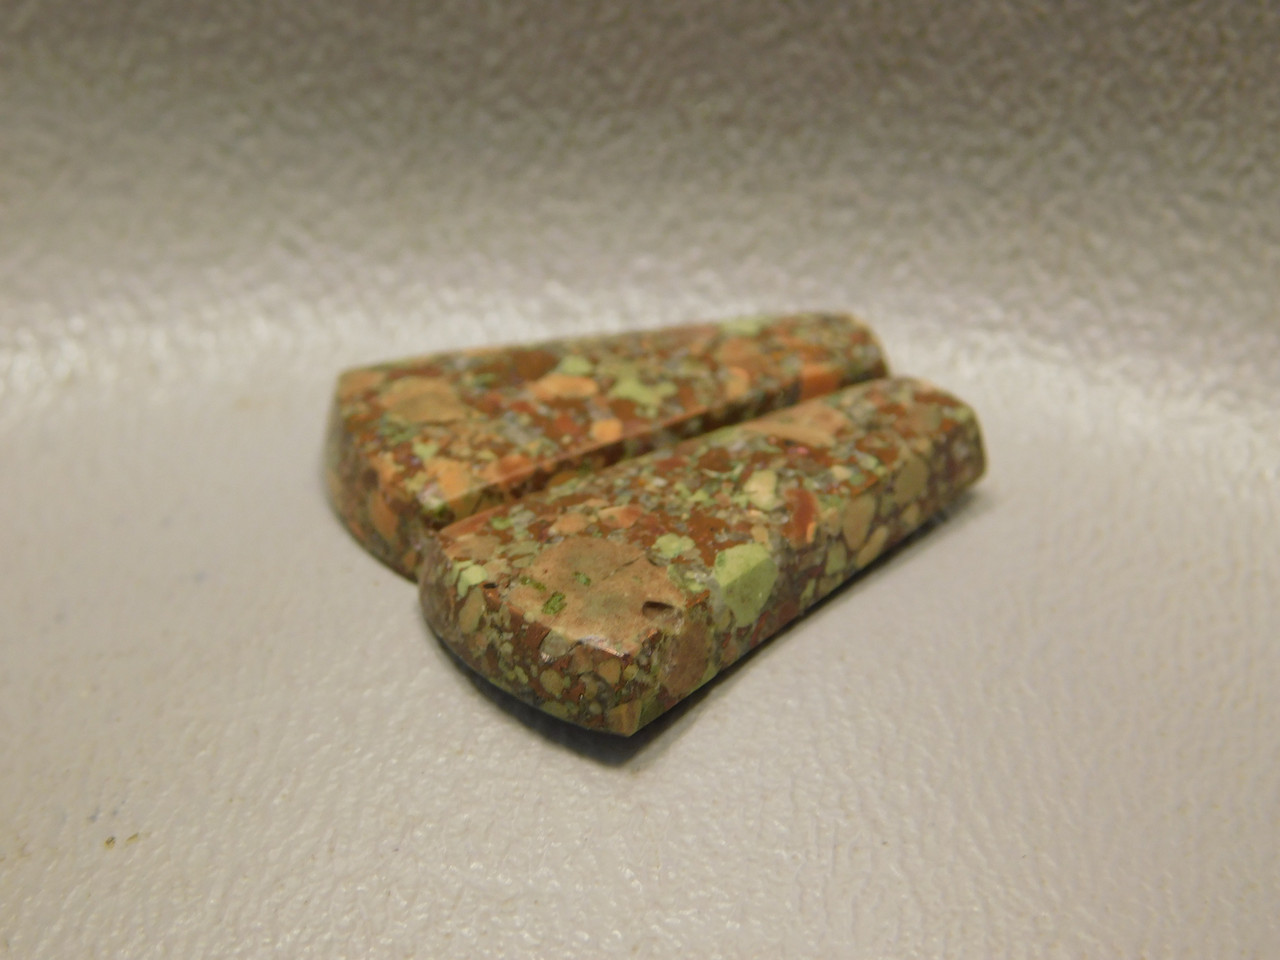 Copper Rose Semi Precious Gemstone Matched Pair Cabochons #18